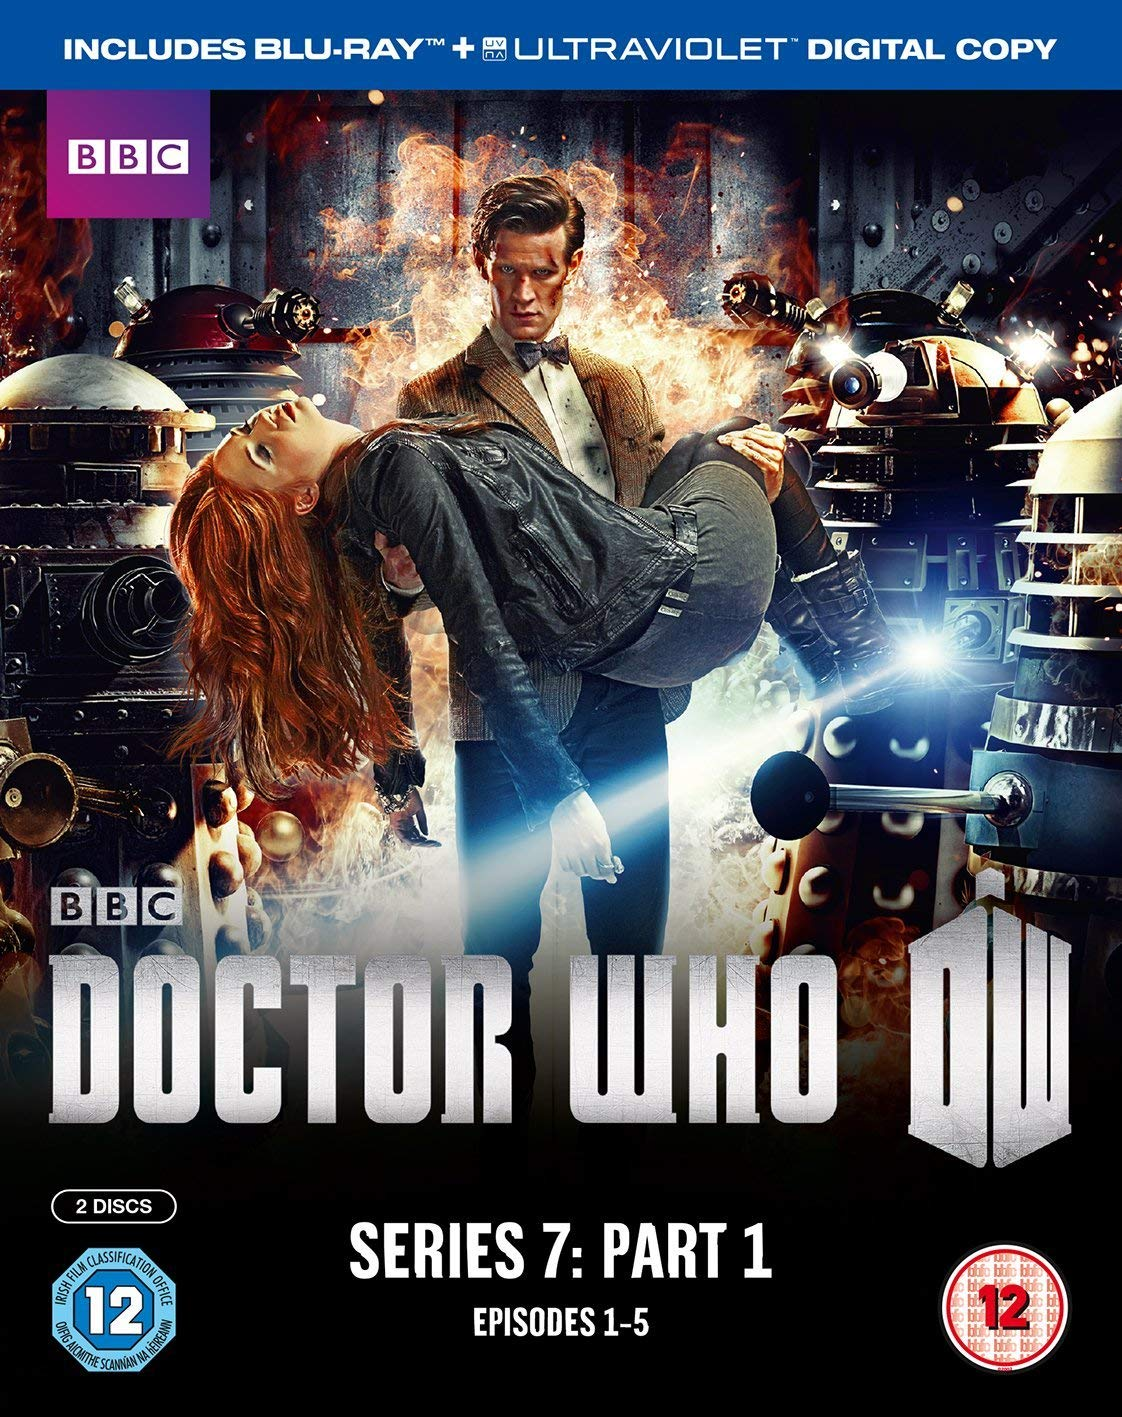 Doctor Who - Series 7 Part 1 [Reino Unido] [Blu-ray]: Amazon.es: Matt Smith, Karen Gillan, Arthur Darvill, Jenna-Louise Coleman, Mark Williams, Riann Steele, Rupert Graves, Ben Browder, Adrian Scarborough, Steven Berkoff, Jemma